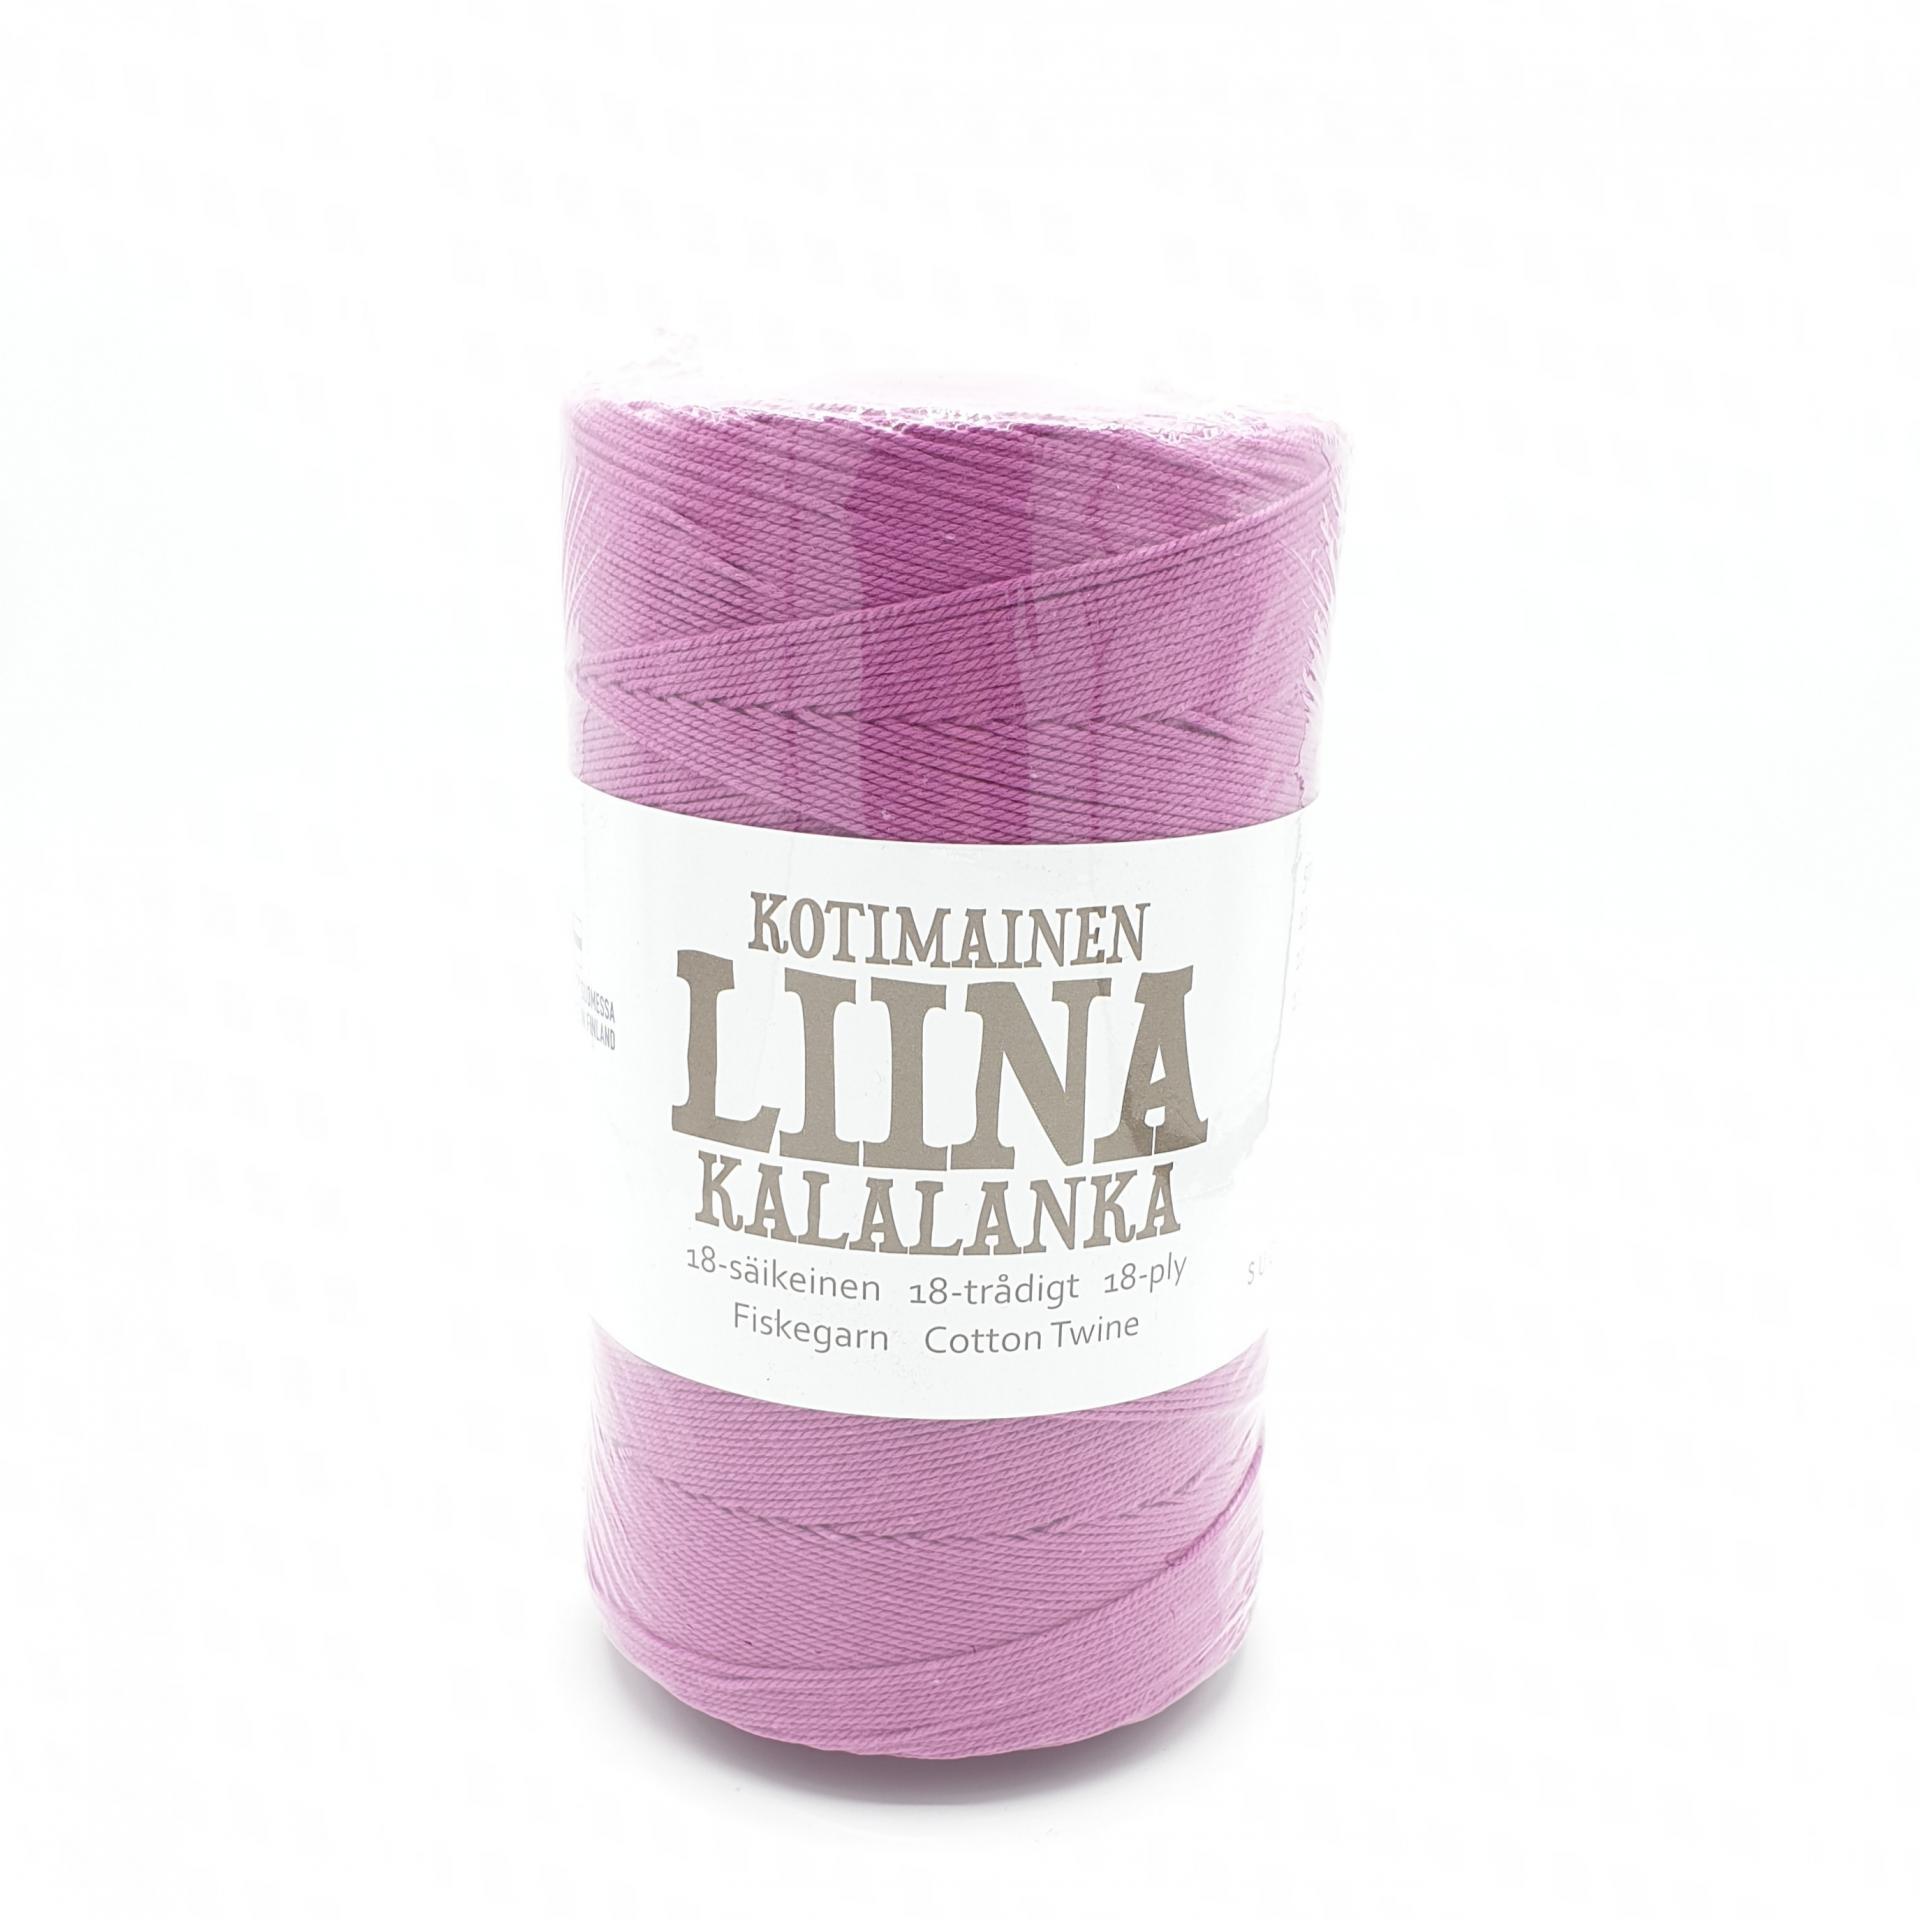 Cono algodón - Liina Kalalanka - Molla Mills - Orquídea